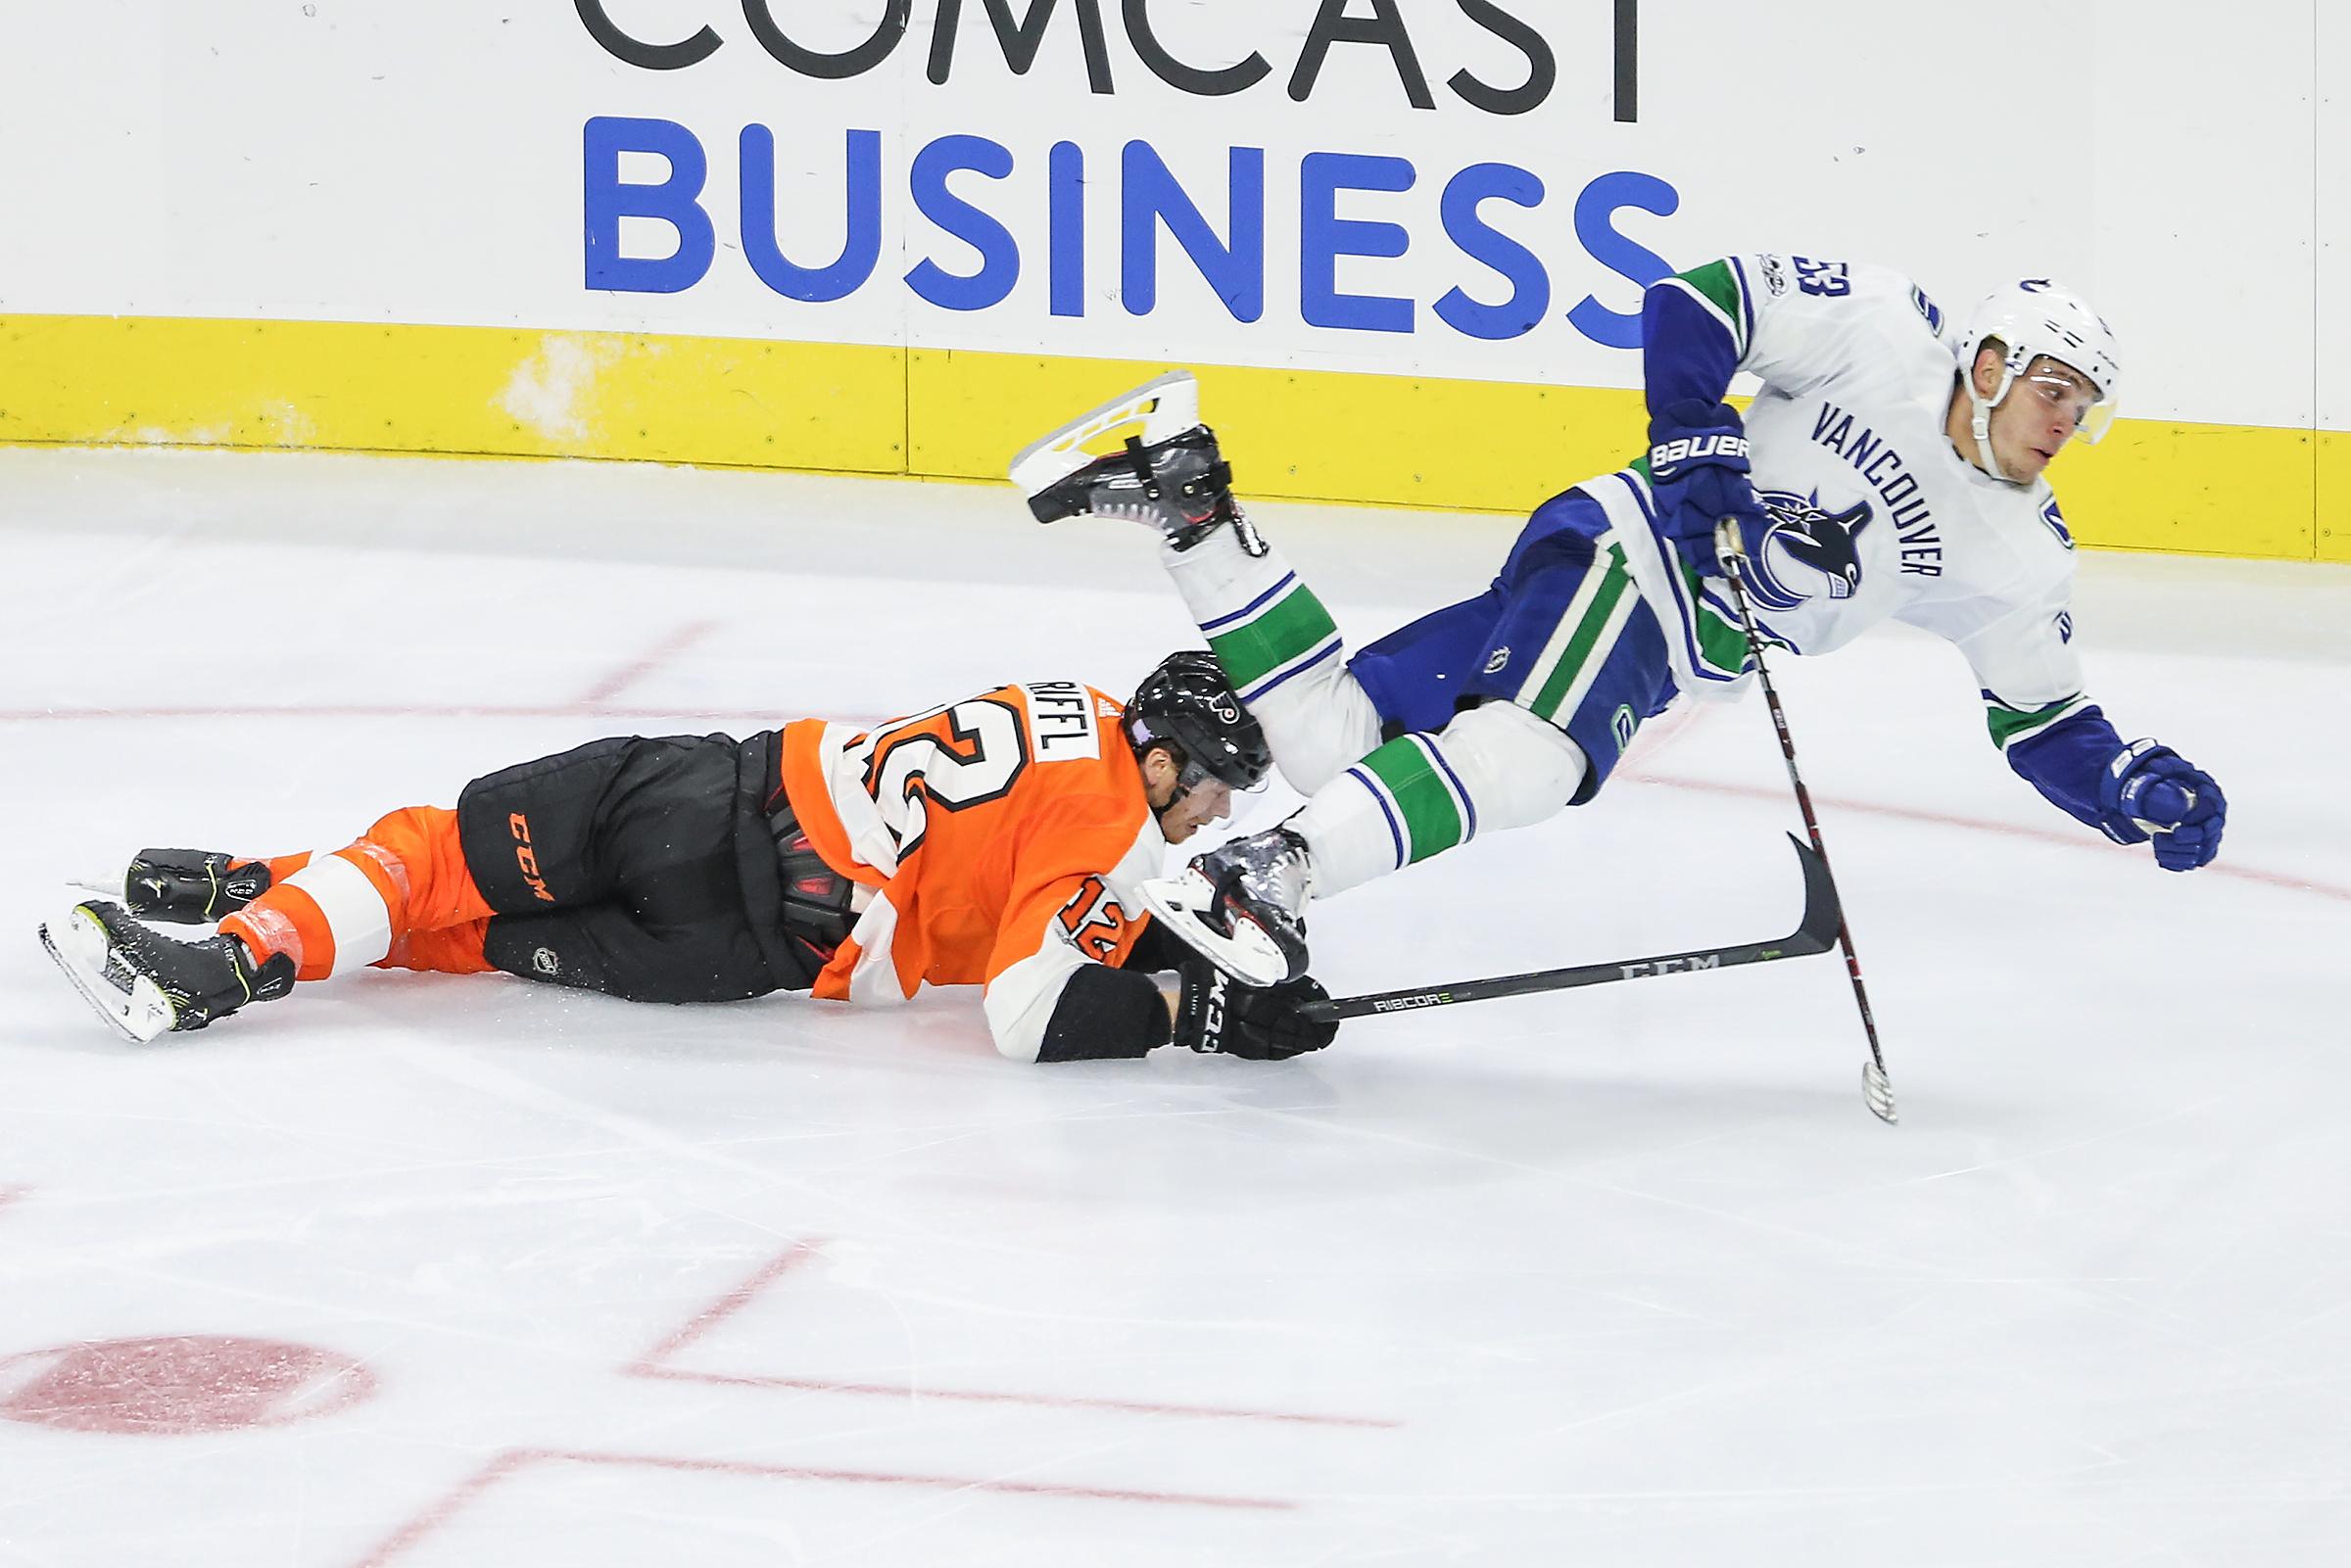 Flyers´ Michael Raffl trips Canucks´ Bo Horvat during the third period at the Wells Fargo Center in Philadelphia,.Tuesday, November 21, 2017. Canucks beat the Flyers 5-2. STEVEN M. FALK / Staff Photographer